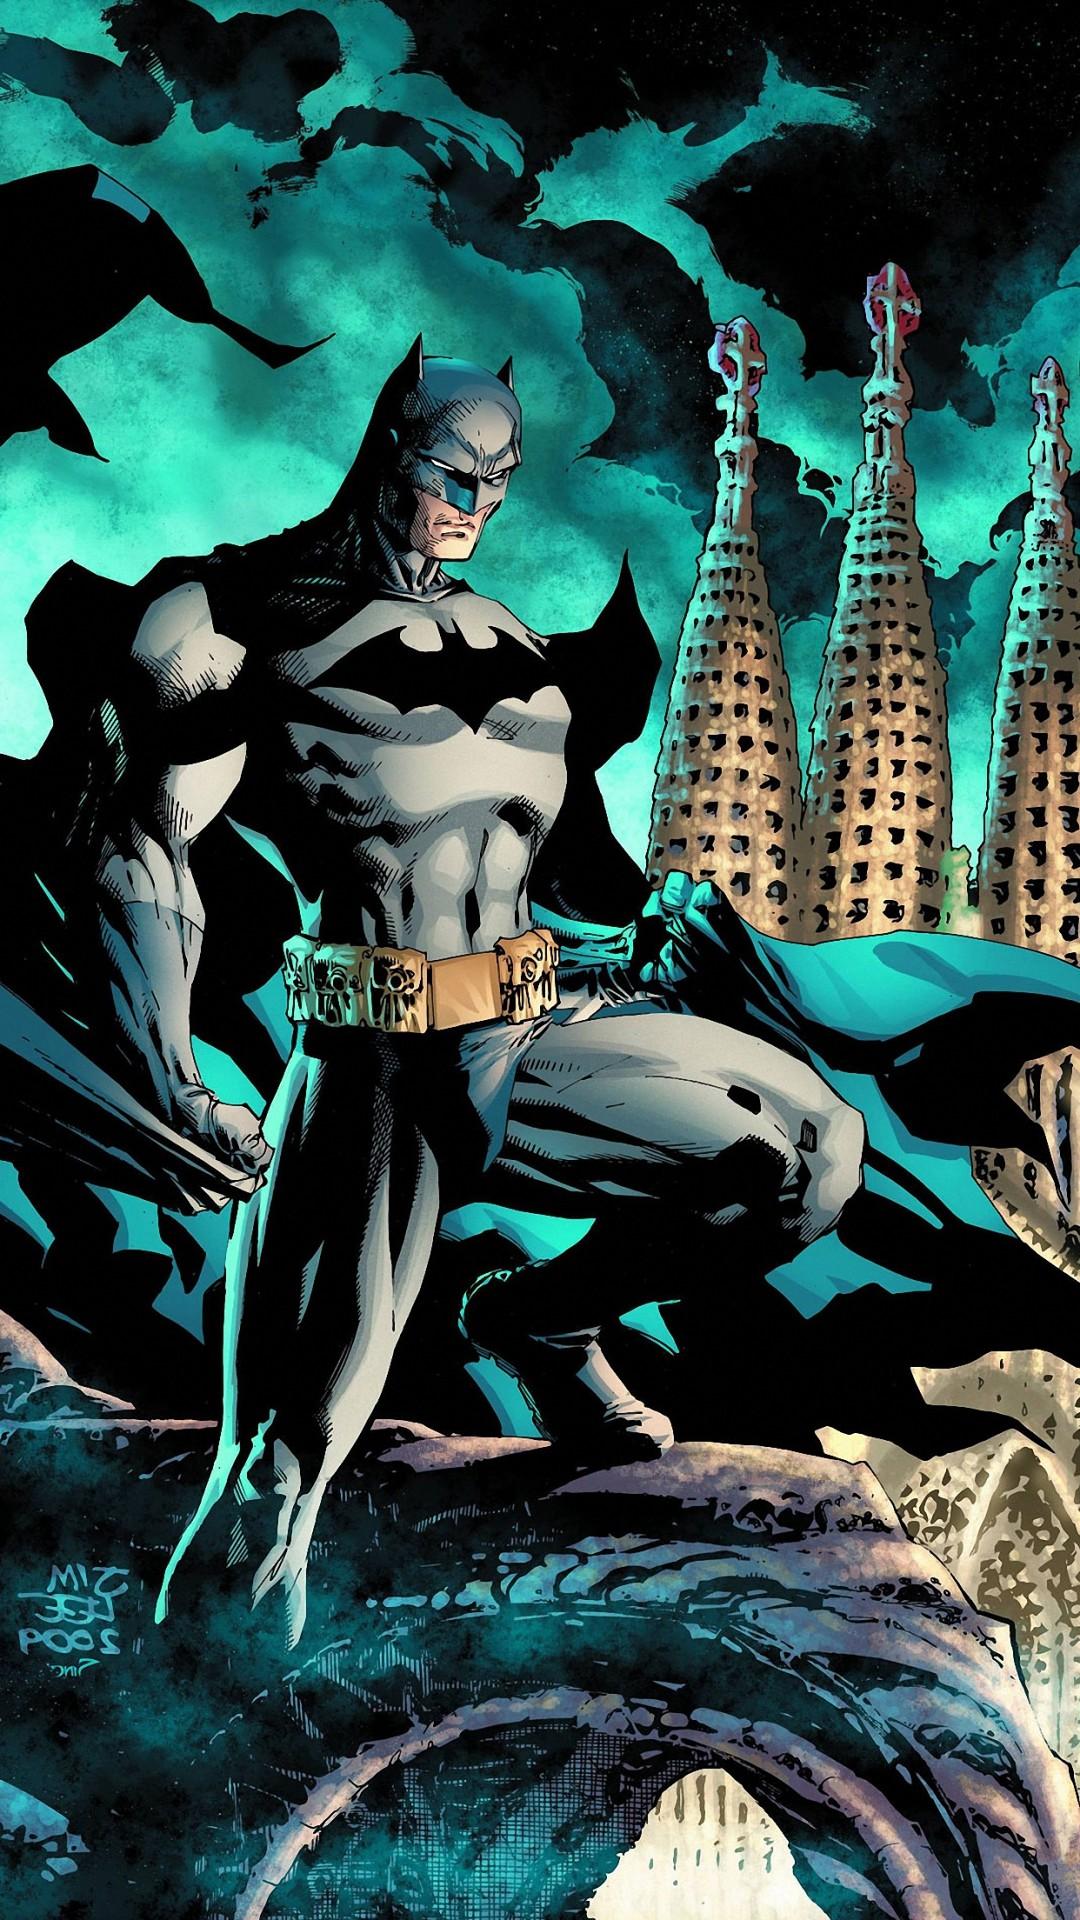 Batman Movie Joker Wallpaper   Movie HD Wallpapers   Batstuff   Pinterest    Joker, Batman and Dark knight